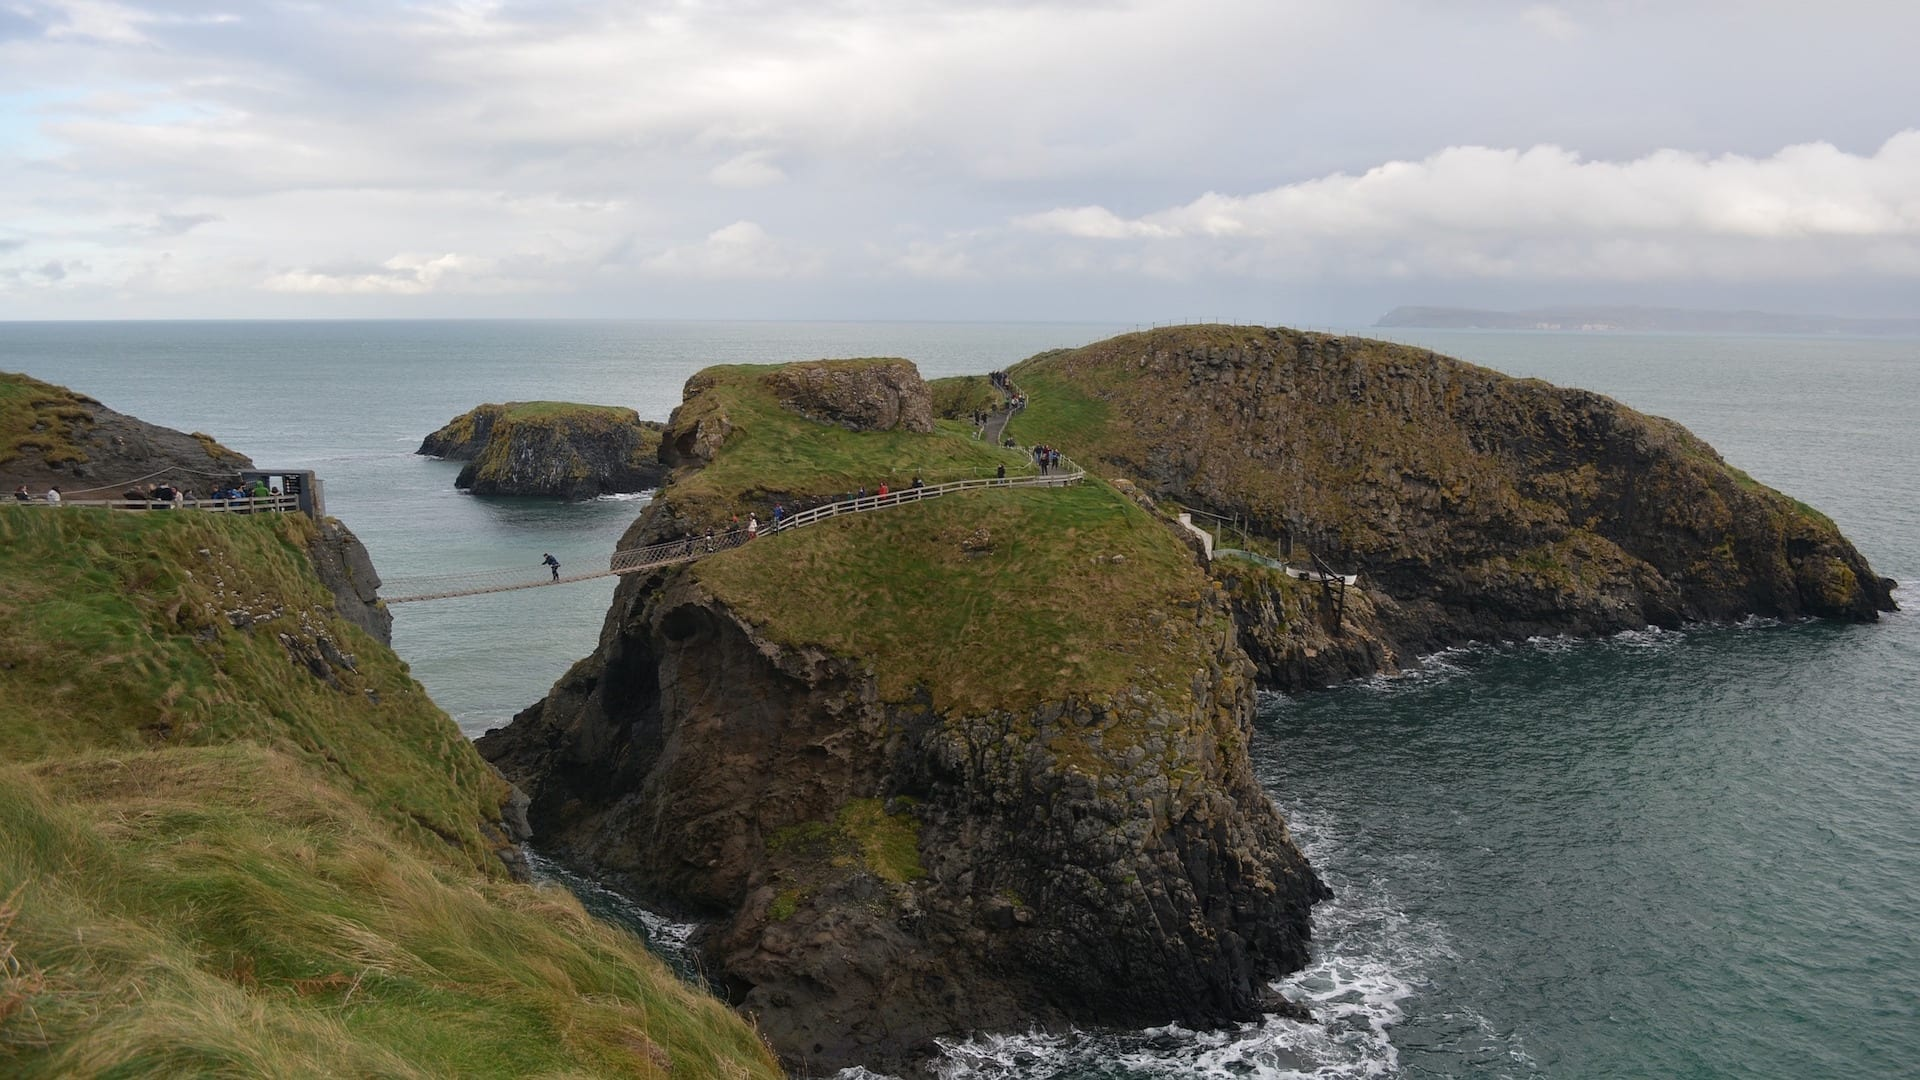 Visitar Irlanda: Belfast y Carrick-a-rede rope Bridge